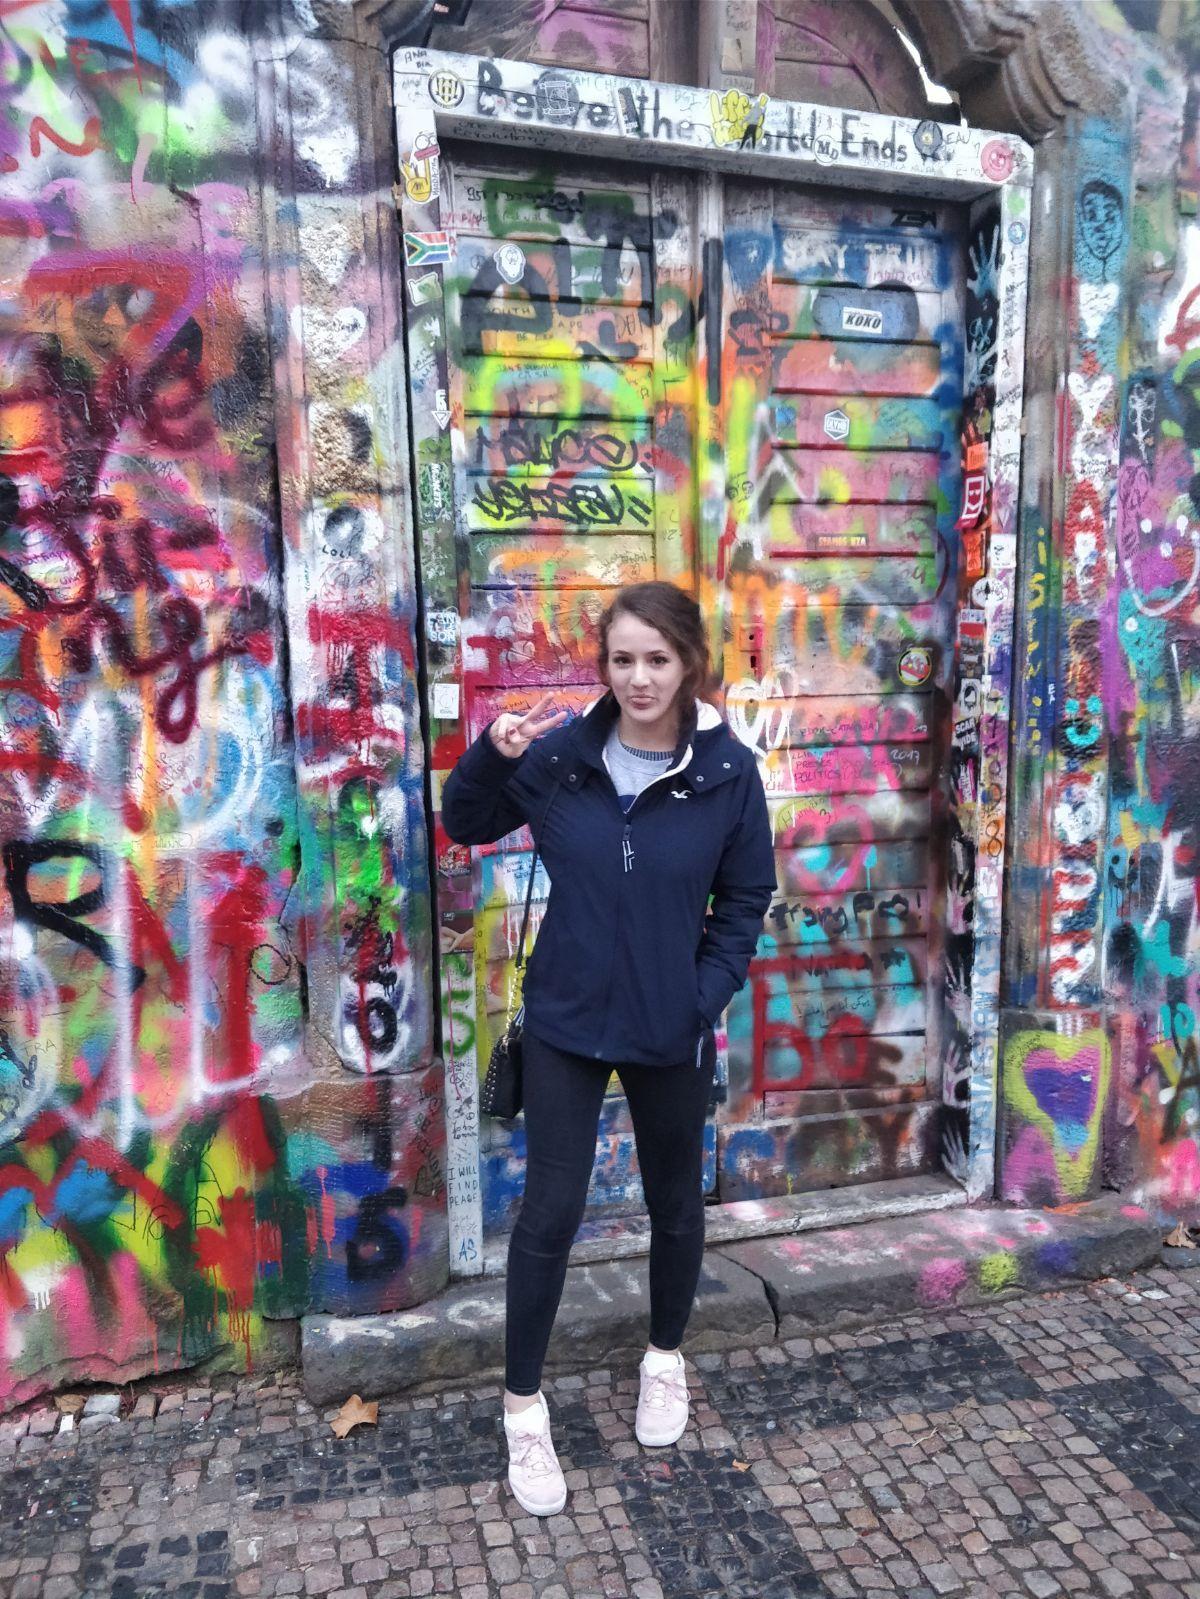 Image may contain: Overcoat, Coat, Female, Path, Walkway, Pants, Wall, Painting, Art, Mural, Graffiti, Human, Person, Footwear, Apparel, Shoe, Clothing